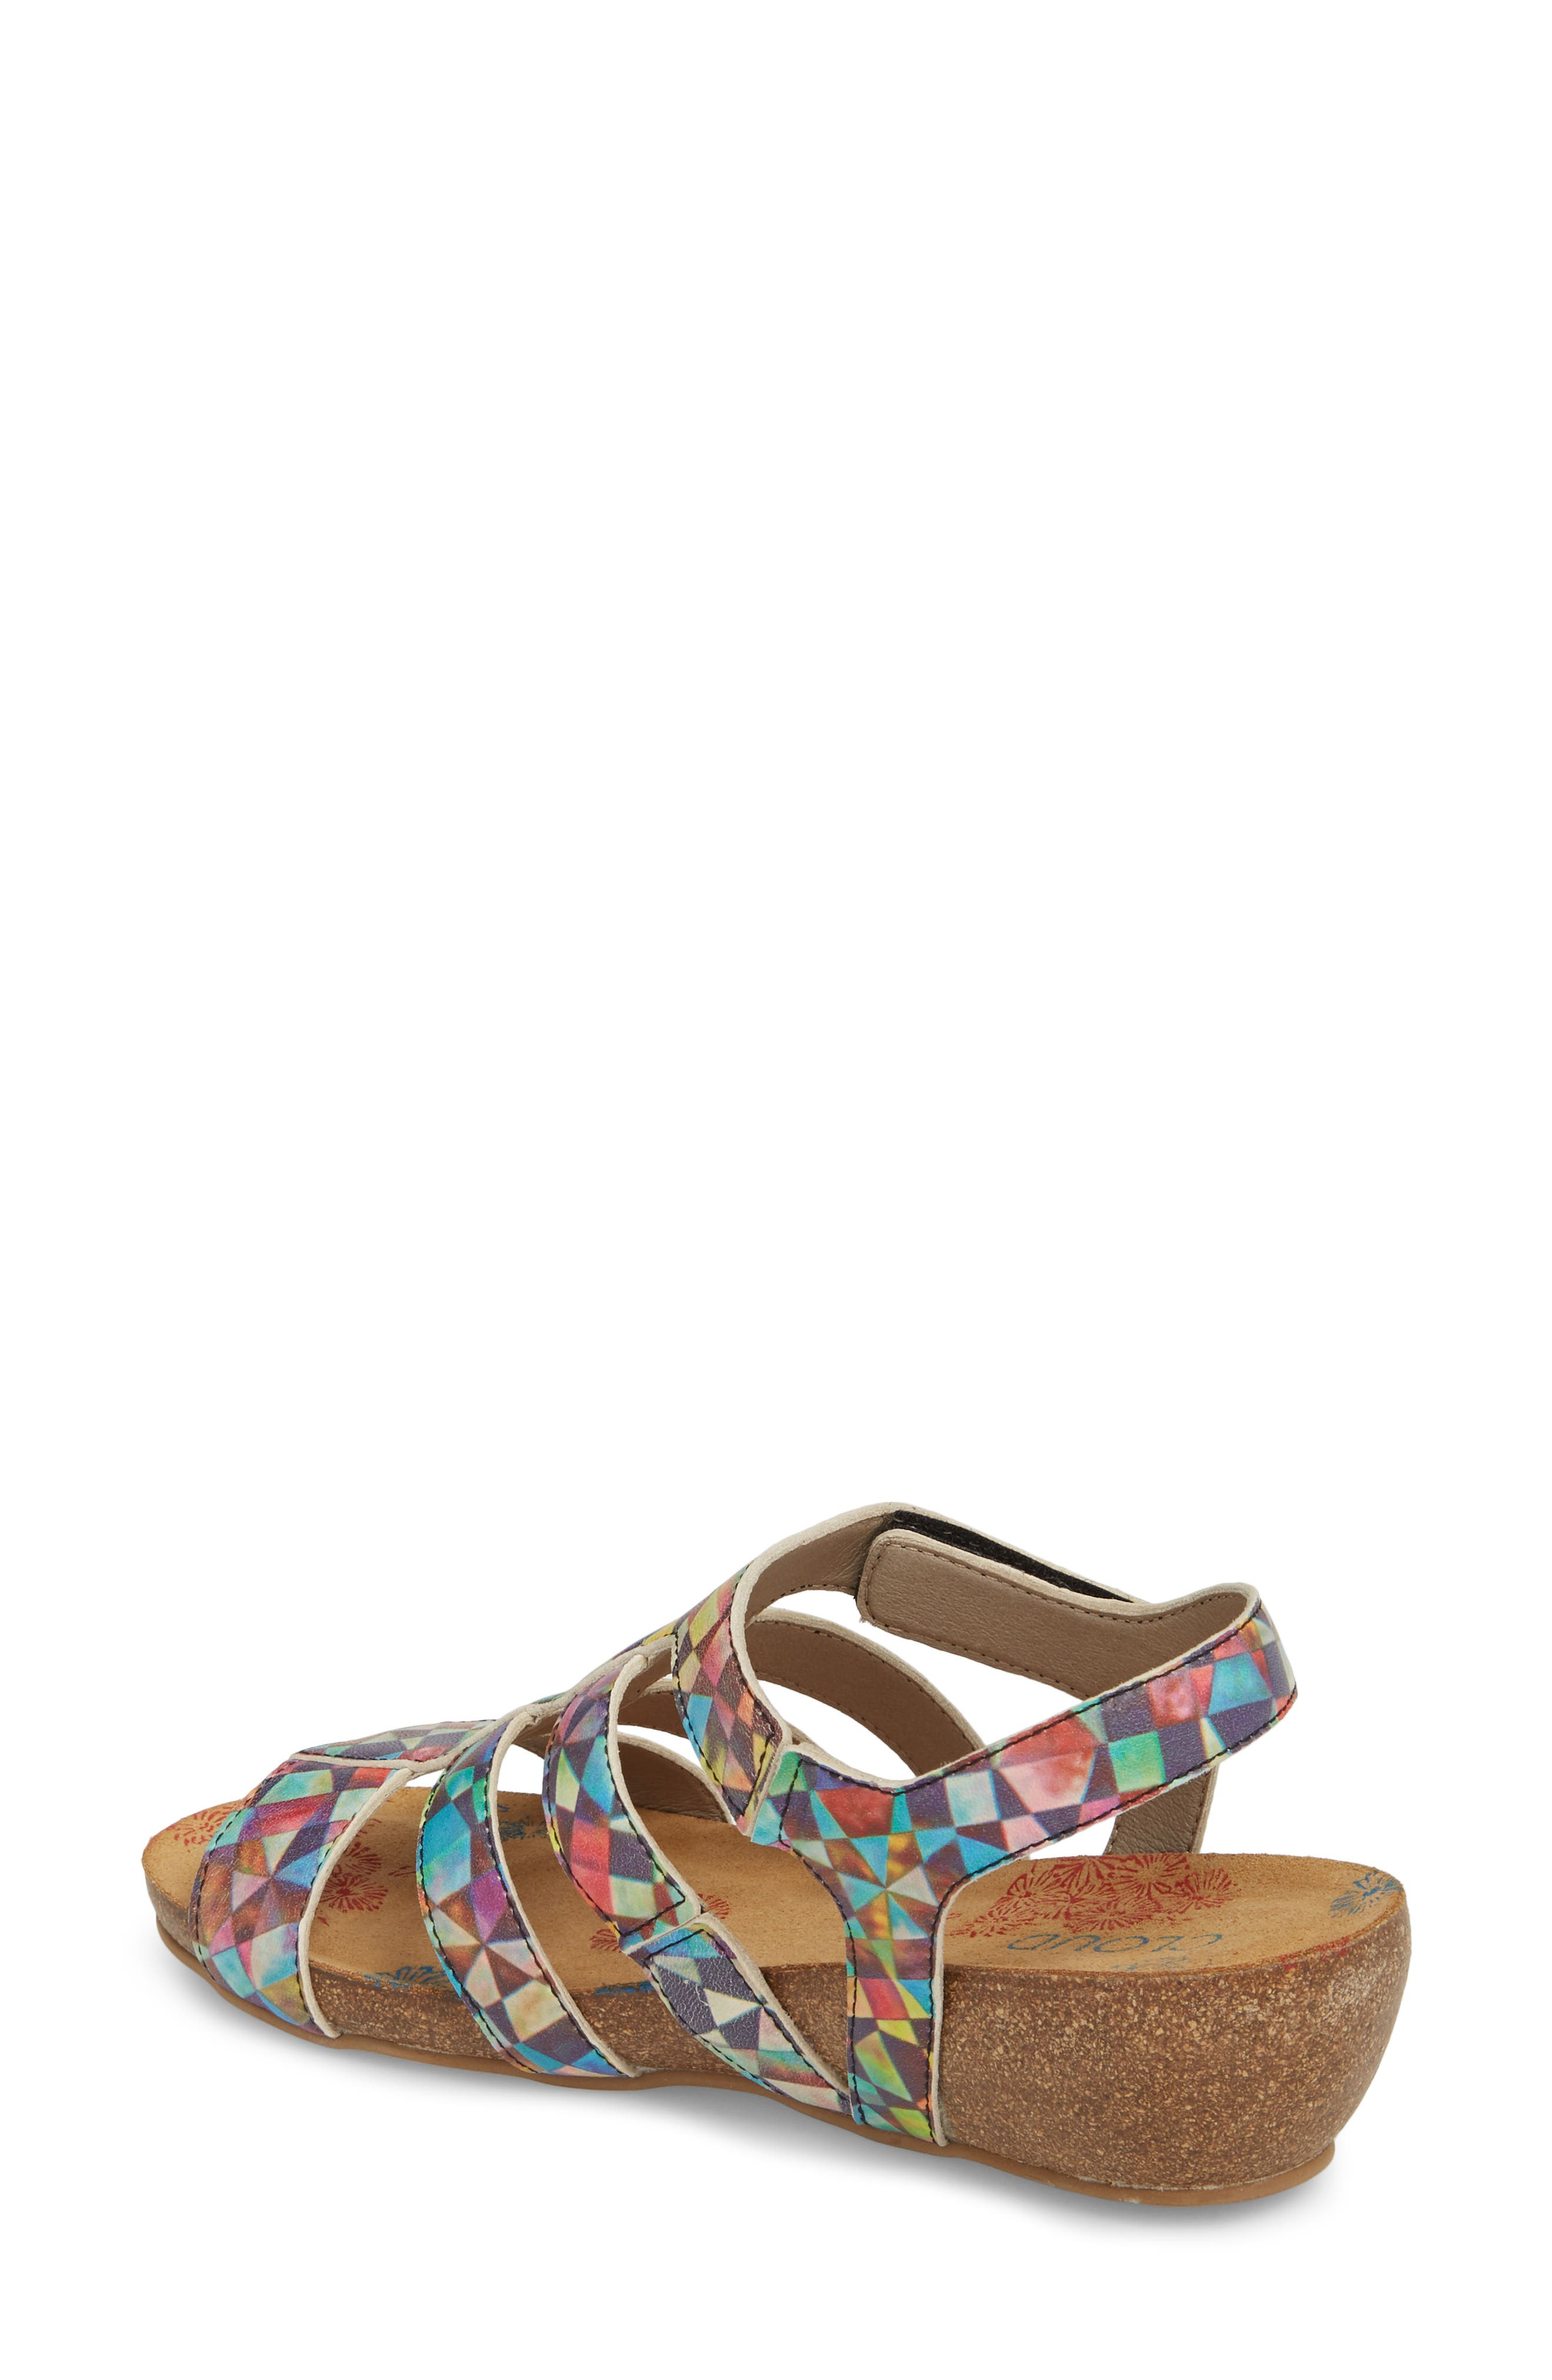 Delta Wedge Sandal,                             Alternate thumbnail 2, color,                             Mystere Leather